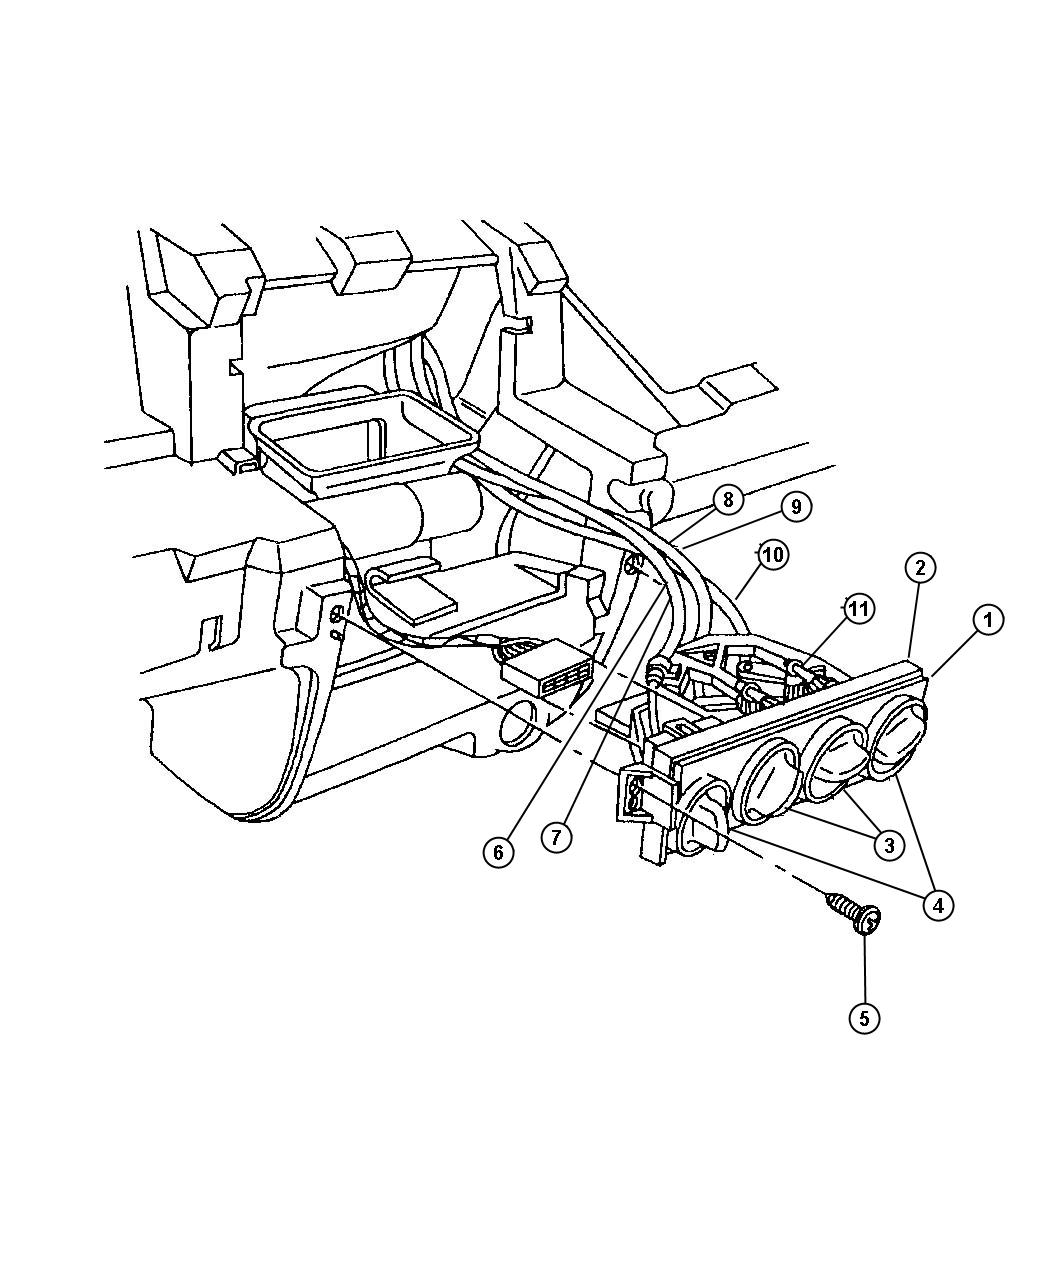 Headlight Wiring Diagram For Dodge Sport